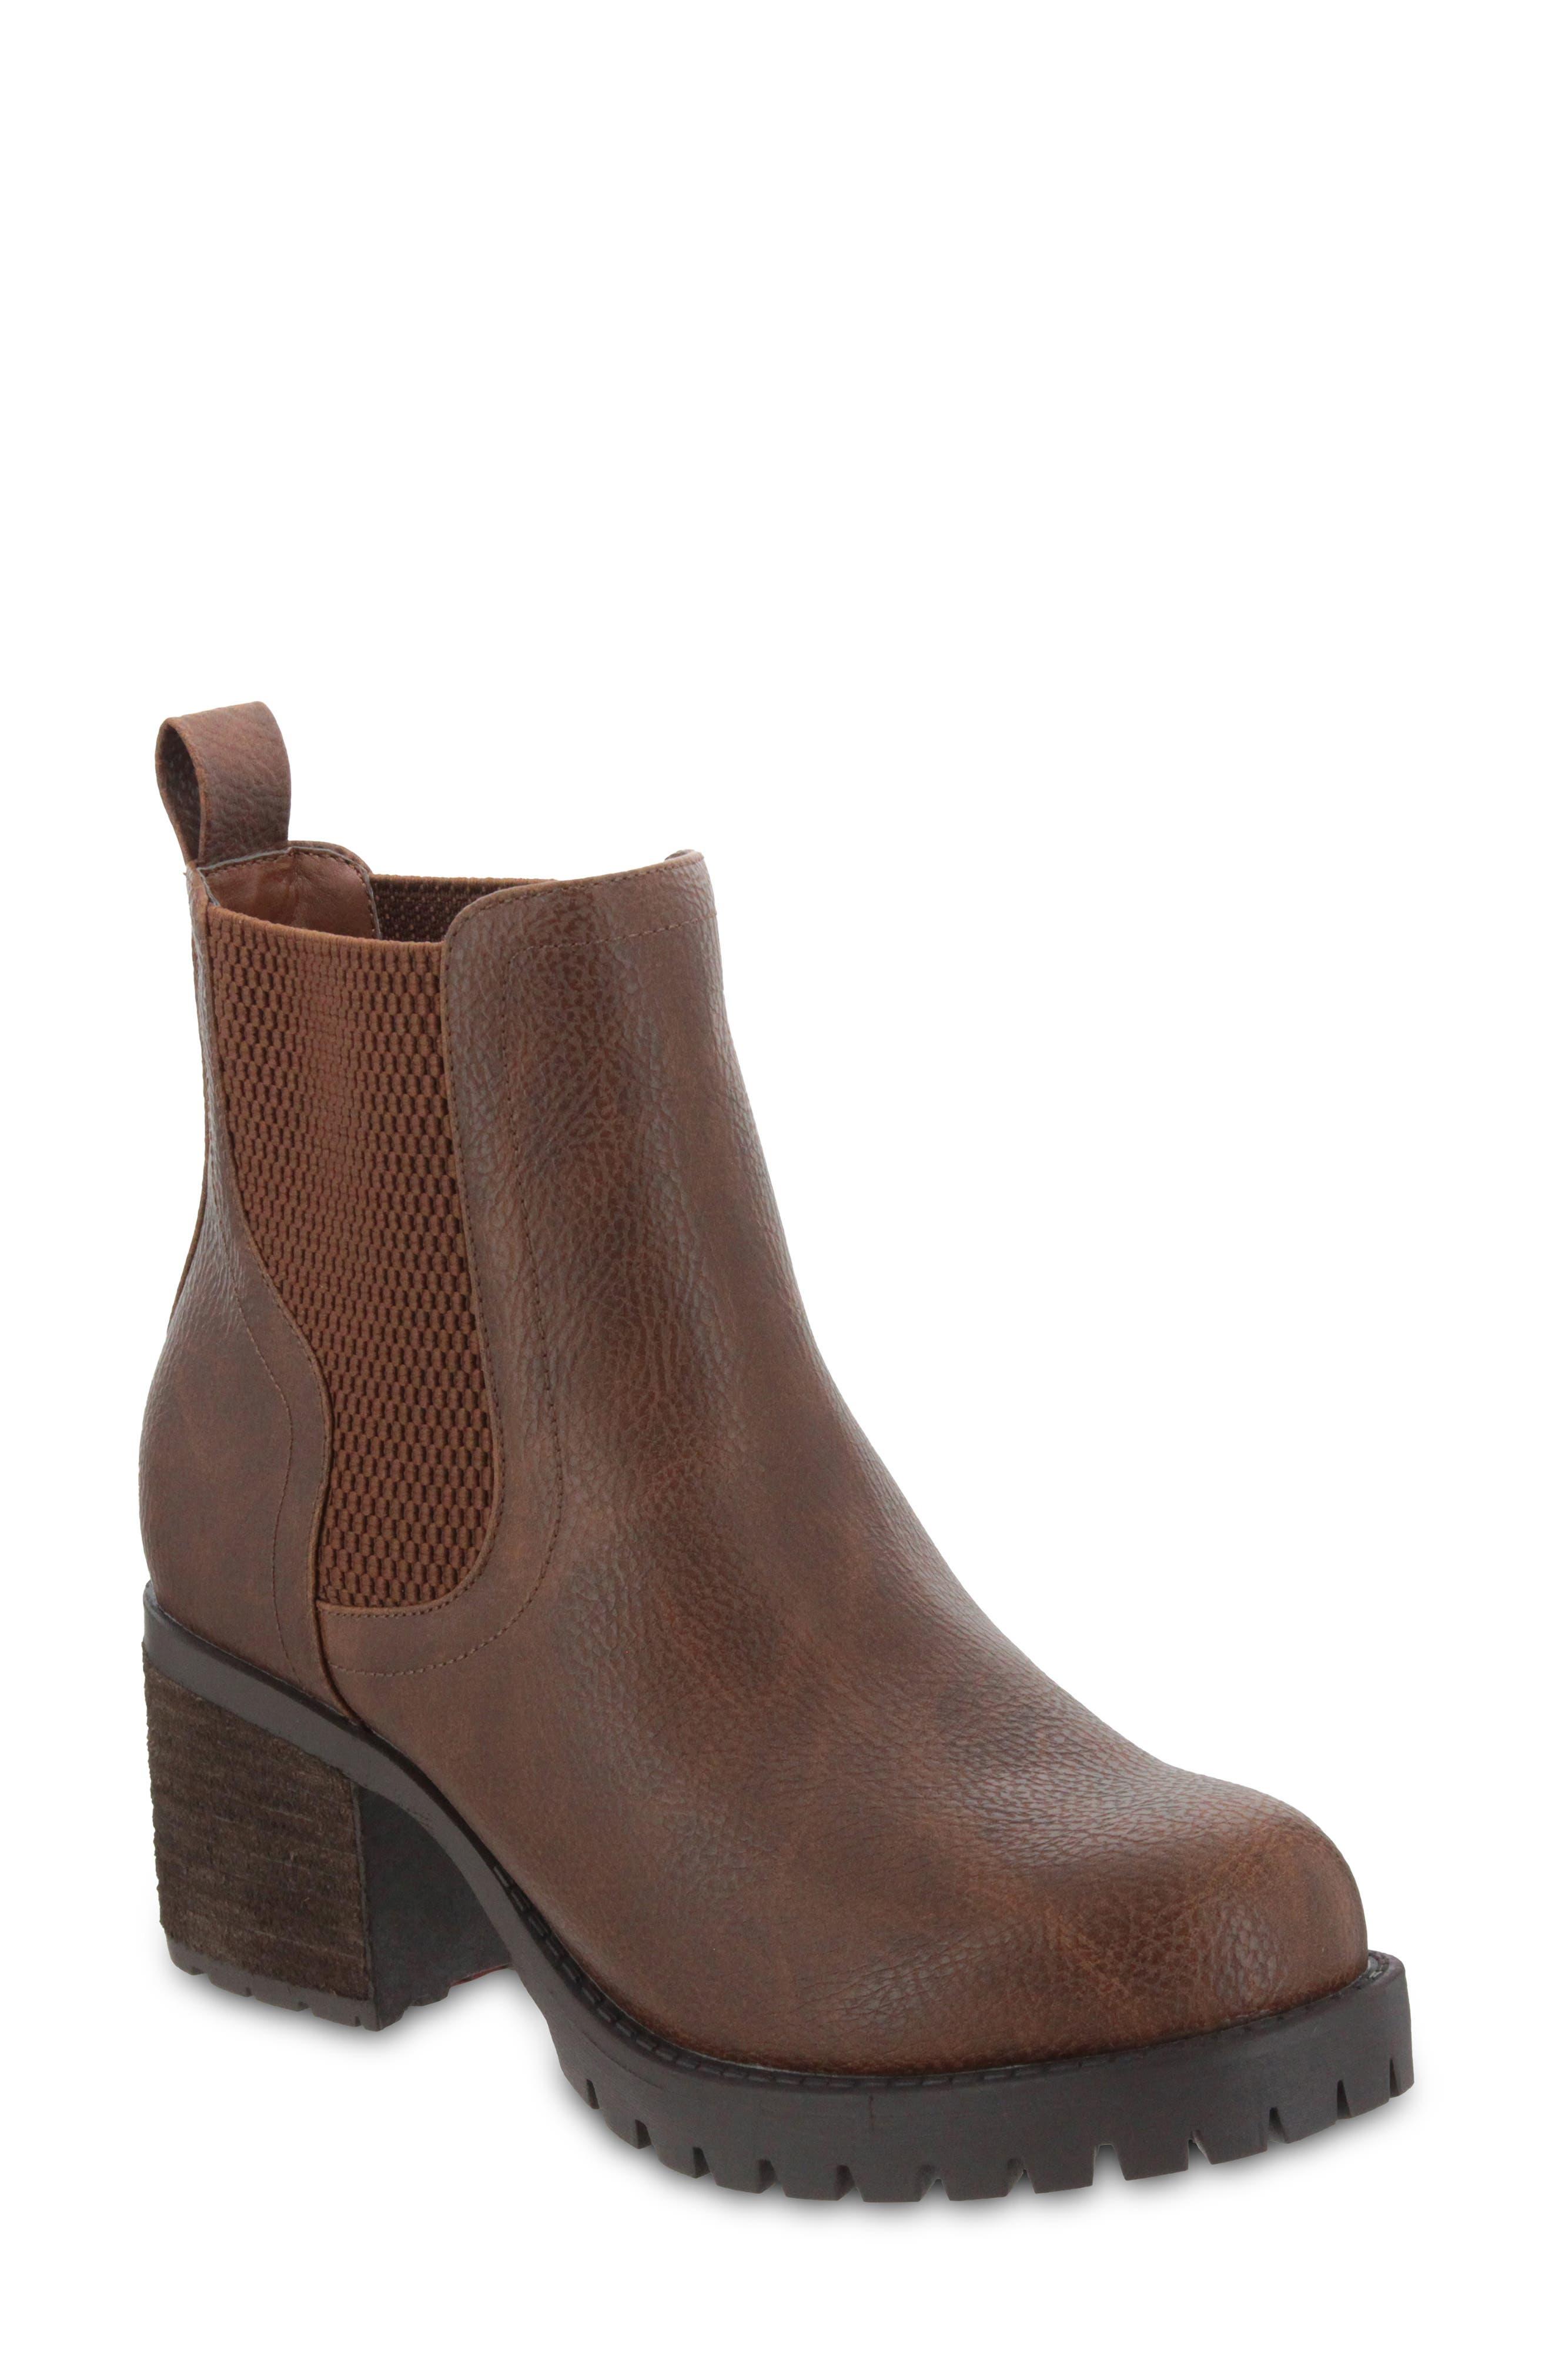 Jonna Lug Sole Chelsea Boot